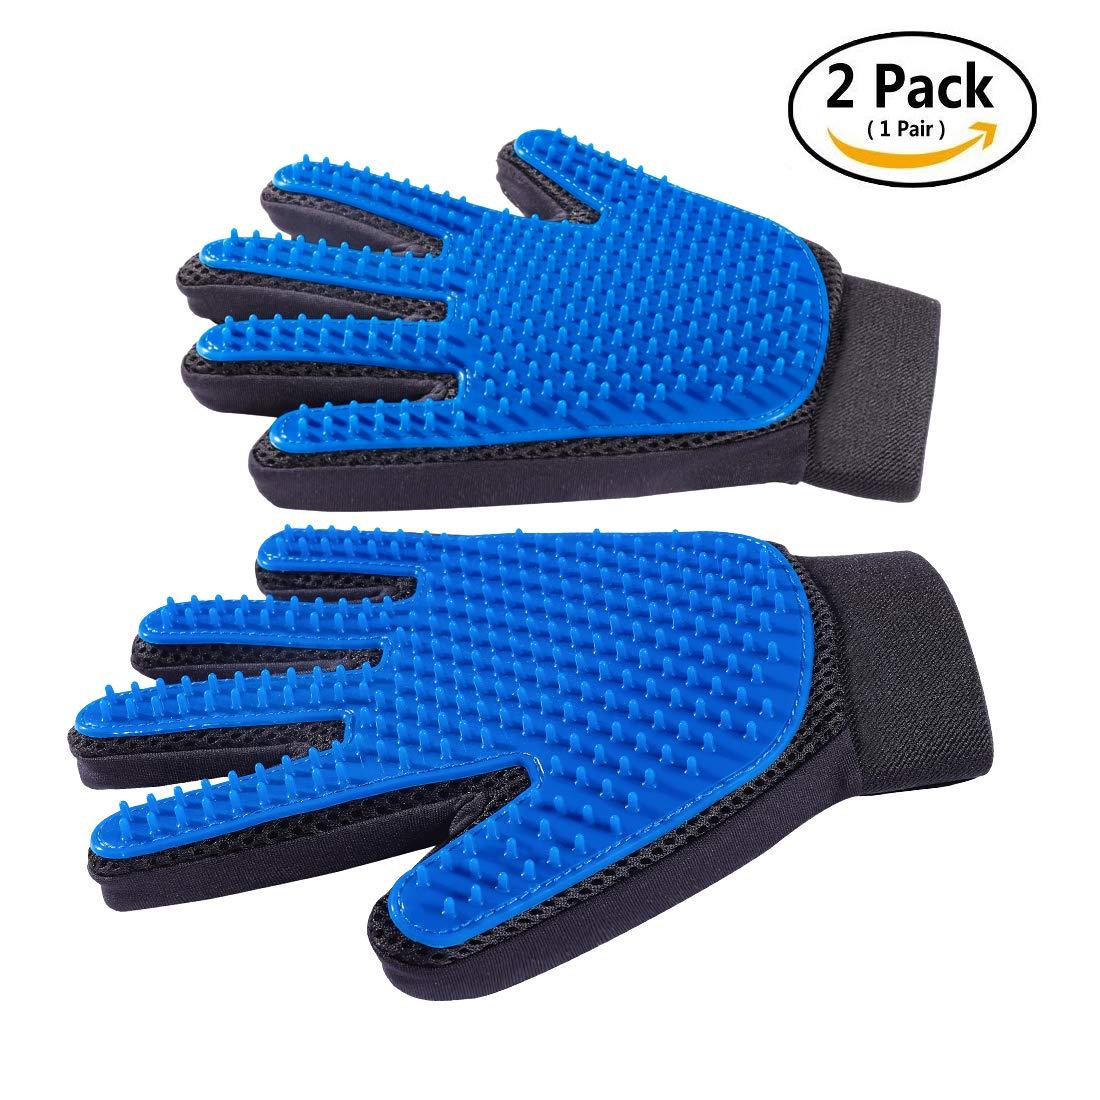 Derosen Deshedding Gloves 1 Pair - Dog Grooming Glove - Cat Glove Brush - Pet Grooming Glove - Dog & Cat Brush - Pet Hair Remover - Pet Hair Removal - Dog Grooming - Grooming Glove - Cat Hair Remover